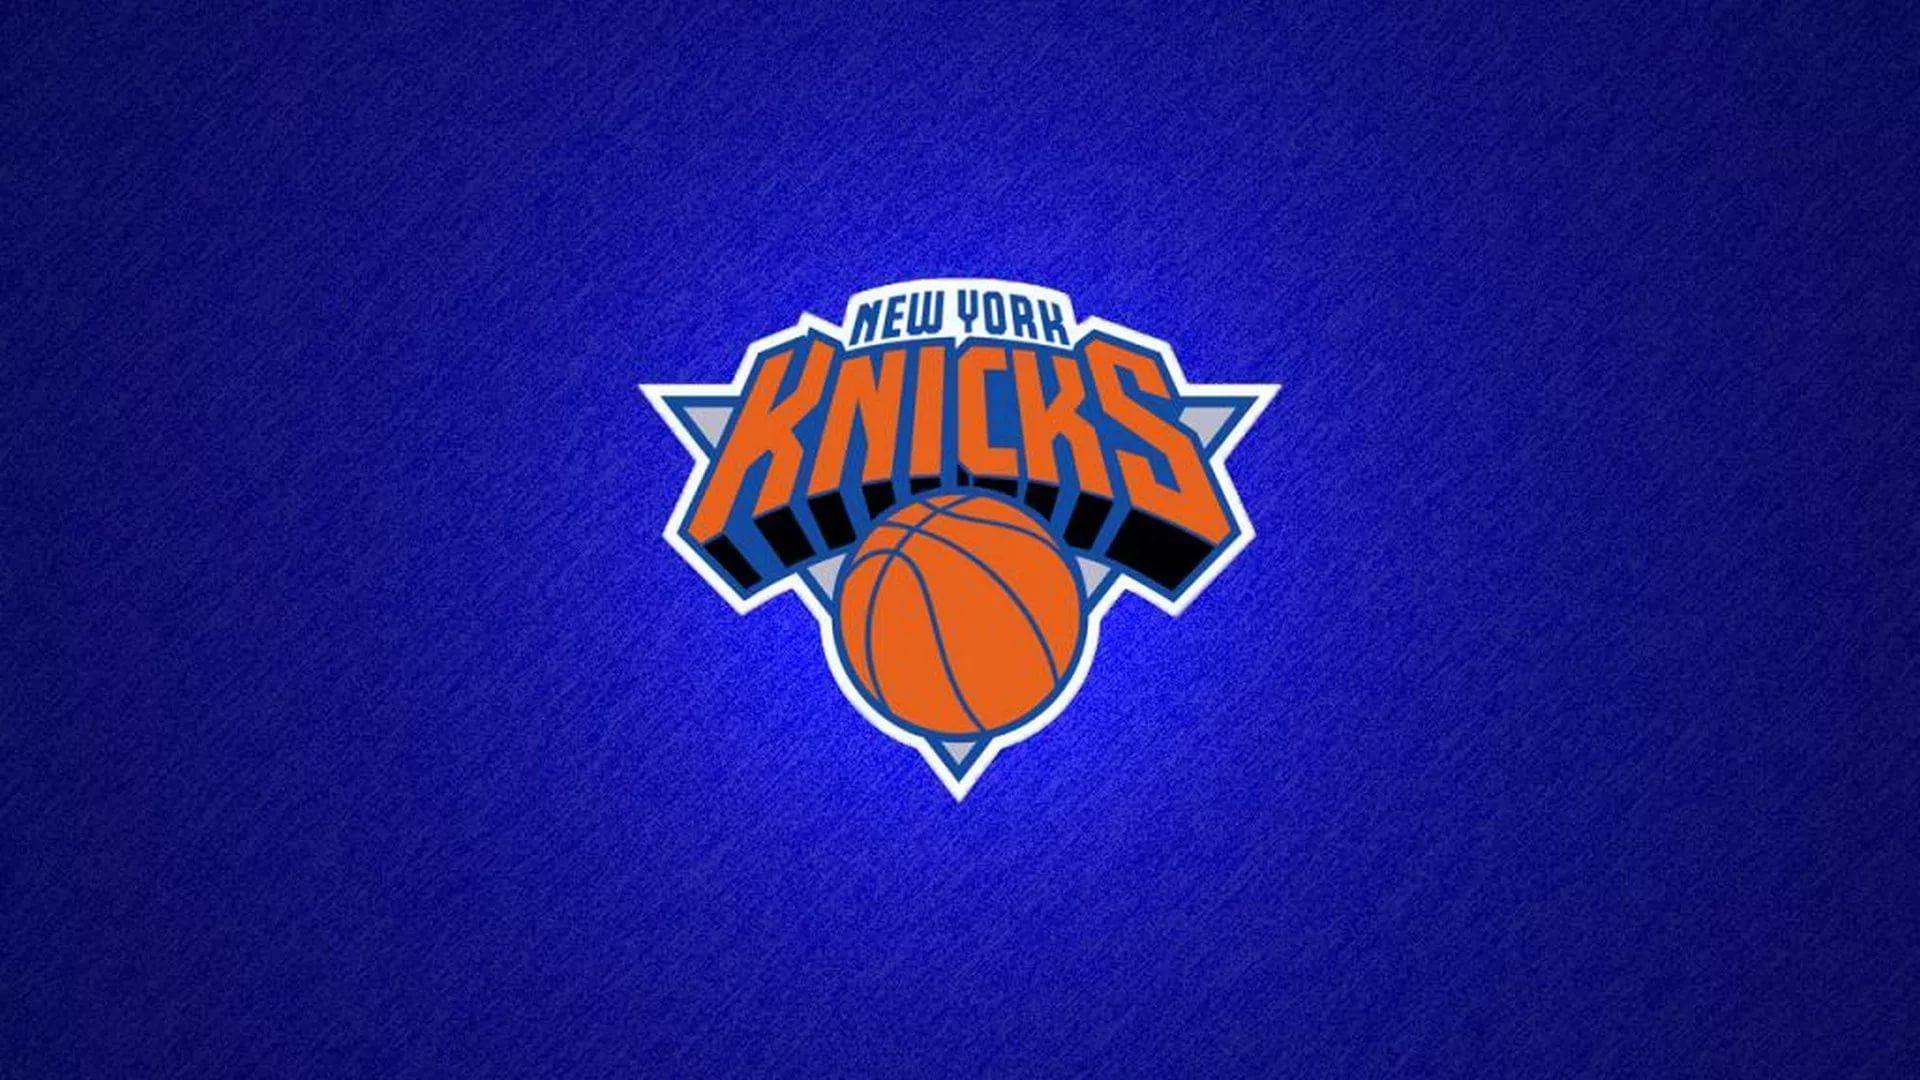 New York Knicks wallpaper image